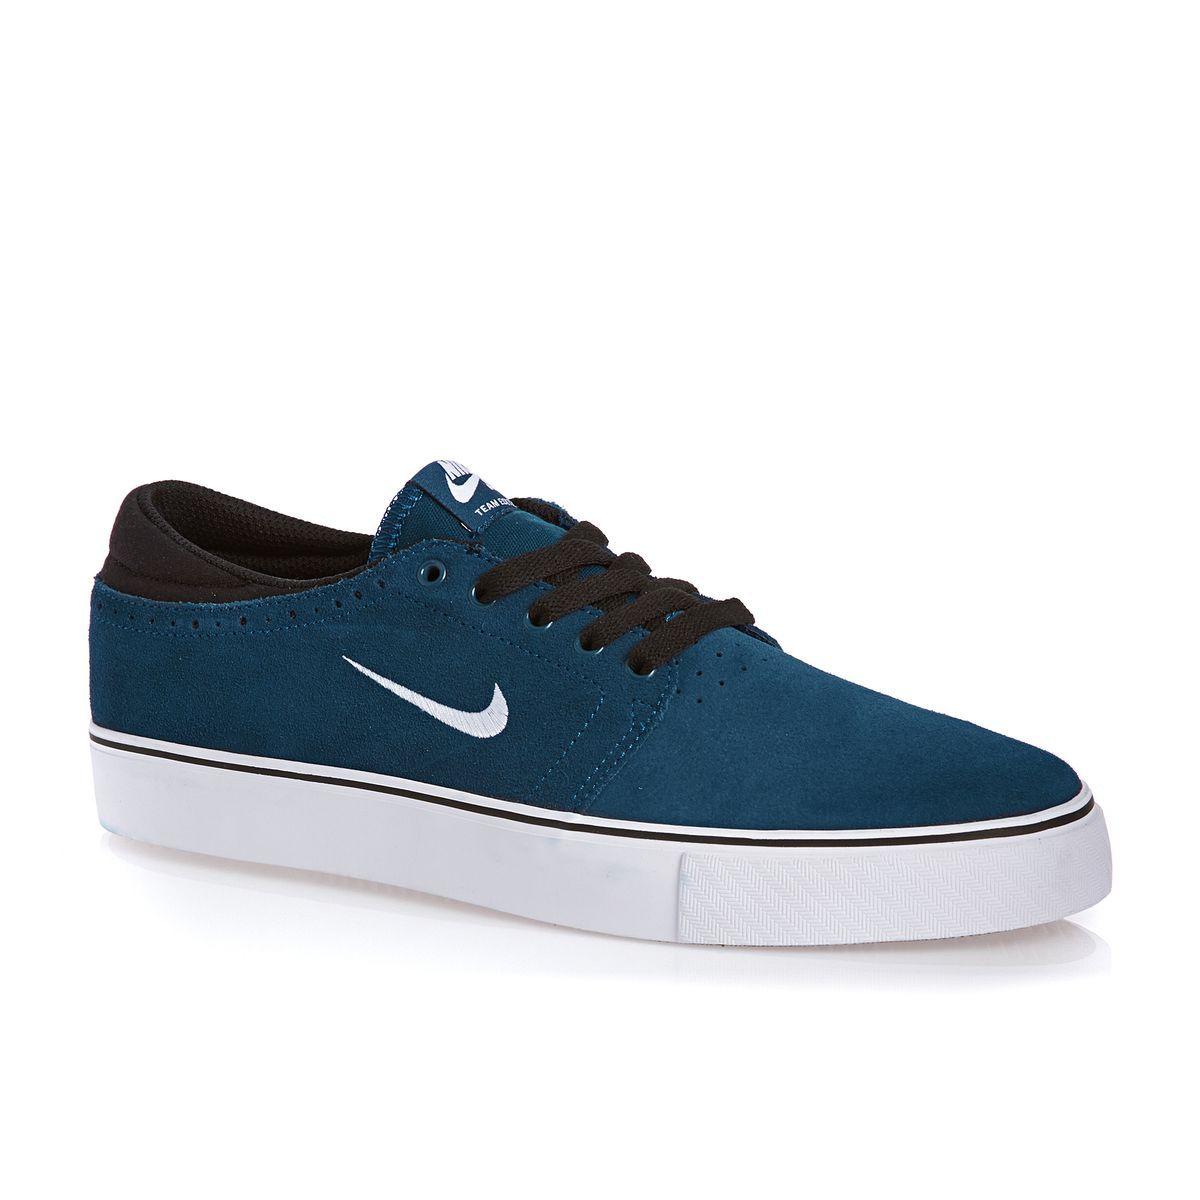 Nike Skateboarding Zoom Team Edition Sb Shoes